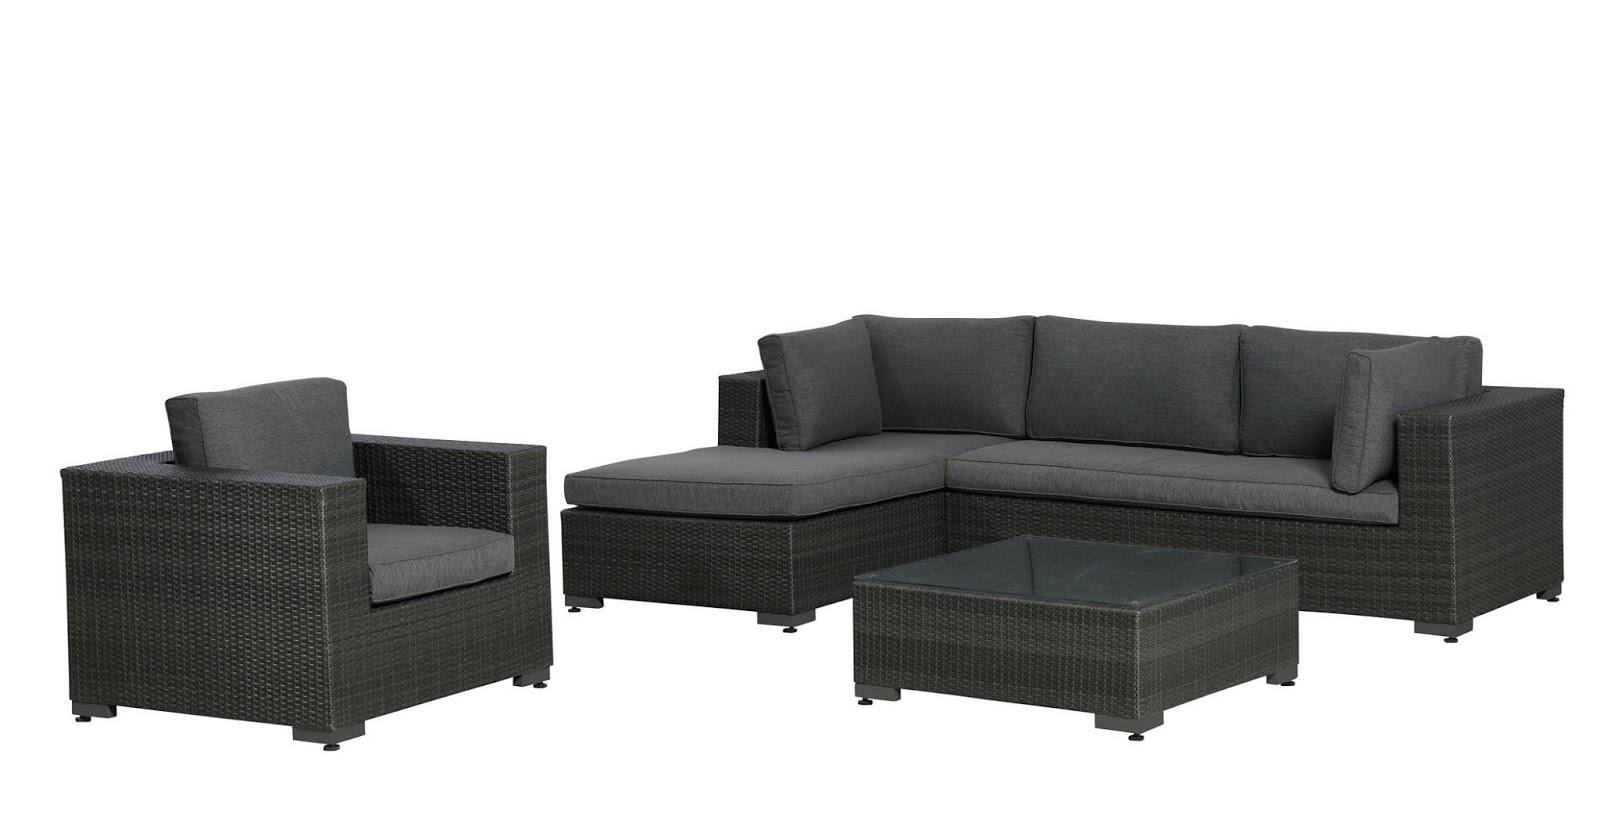 decoration garden m bel und accessoire. Black Bedroom Furniture Sets. Home Design Ideas